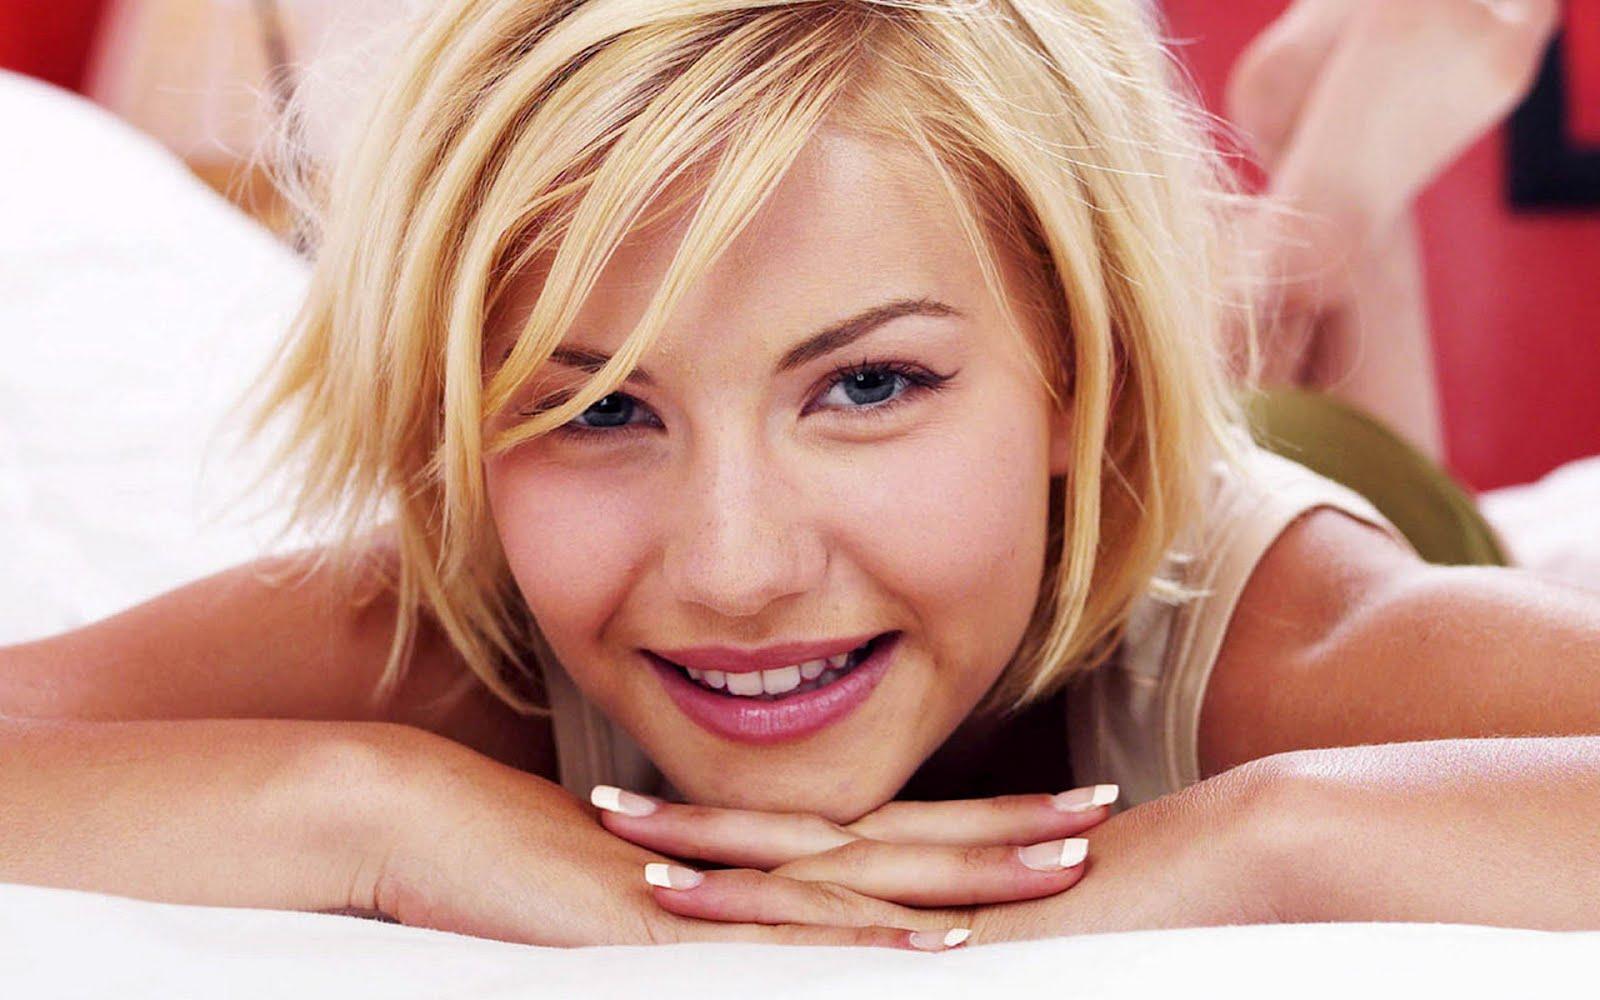 http://2.bp.blogspot.com/-vTAYK5W2UT8/T97cPM7pc-I/AAAAAAAAJnM/0mz8BIx96nk/s1600/HD-wows-Wallpaper.jpg